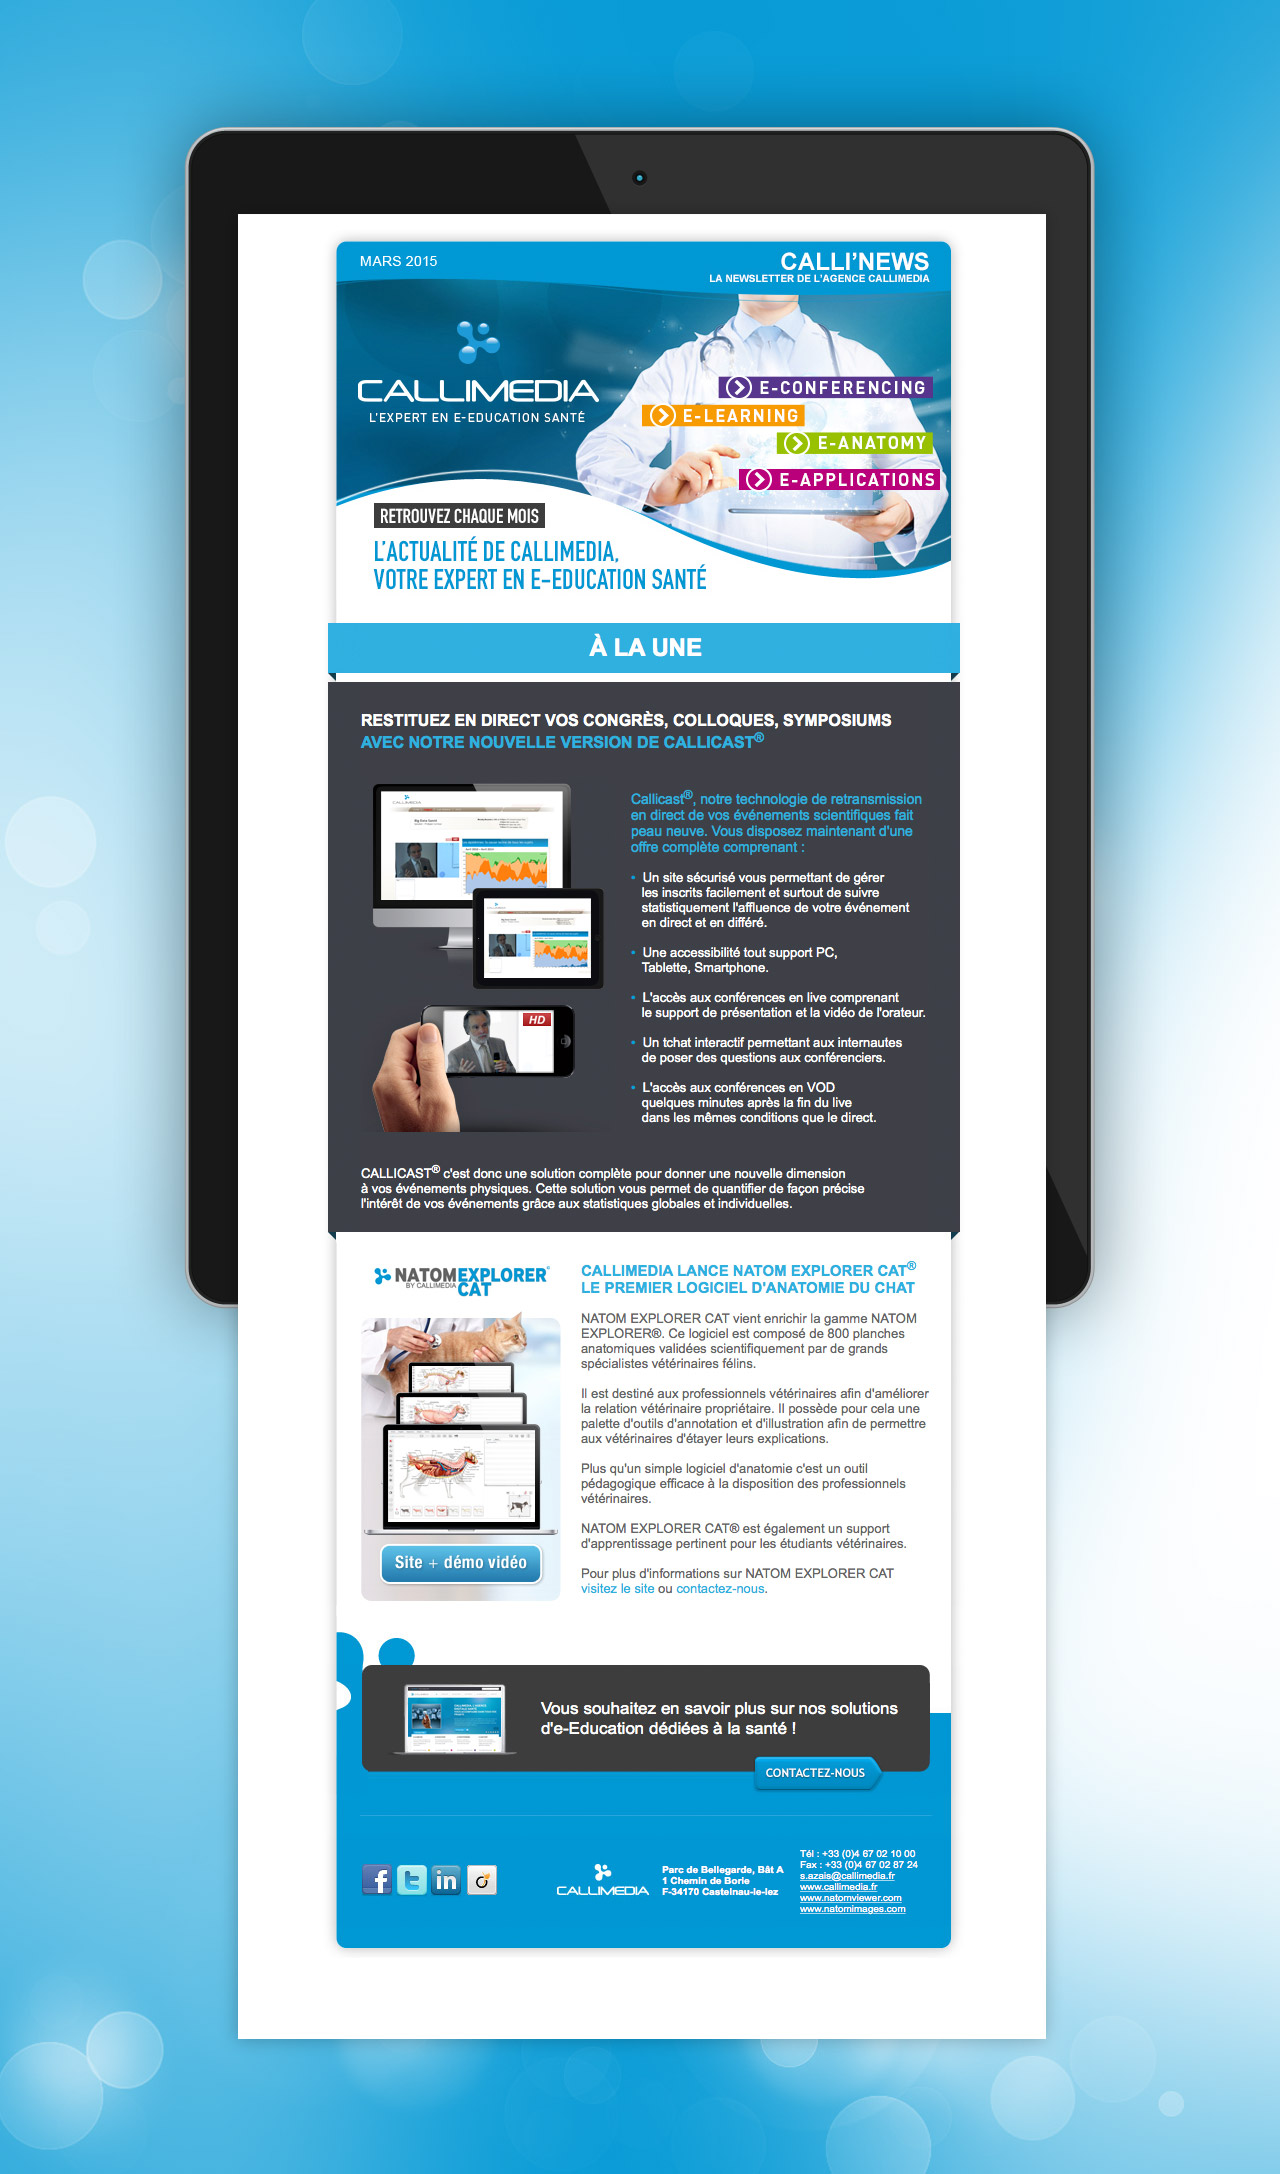 callimedia-newsletter-creation-caconcept-alexis-cretin-graphiste-4